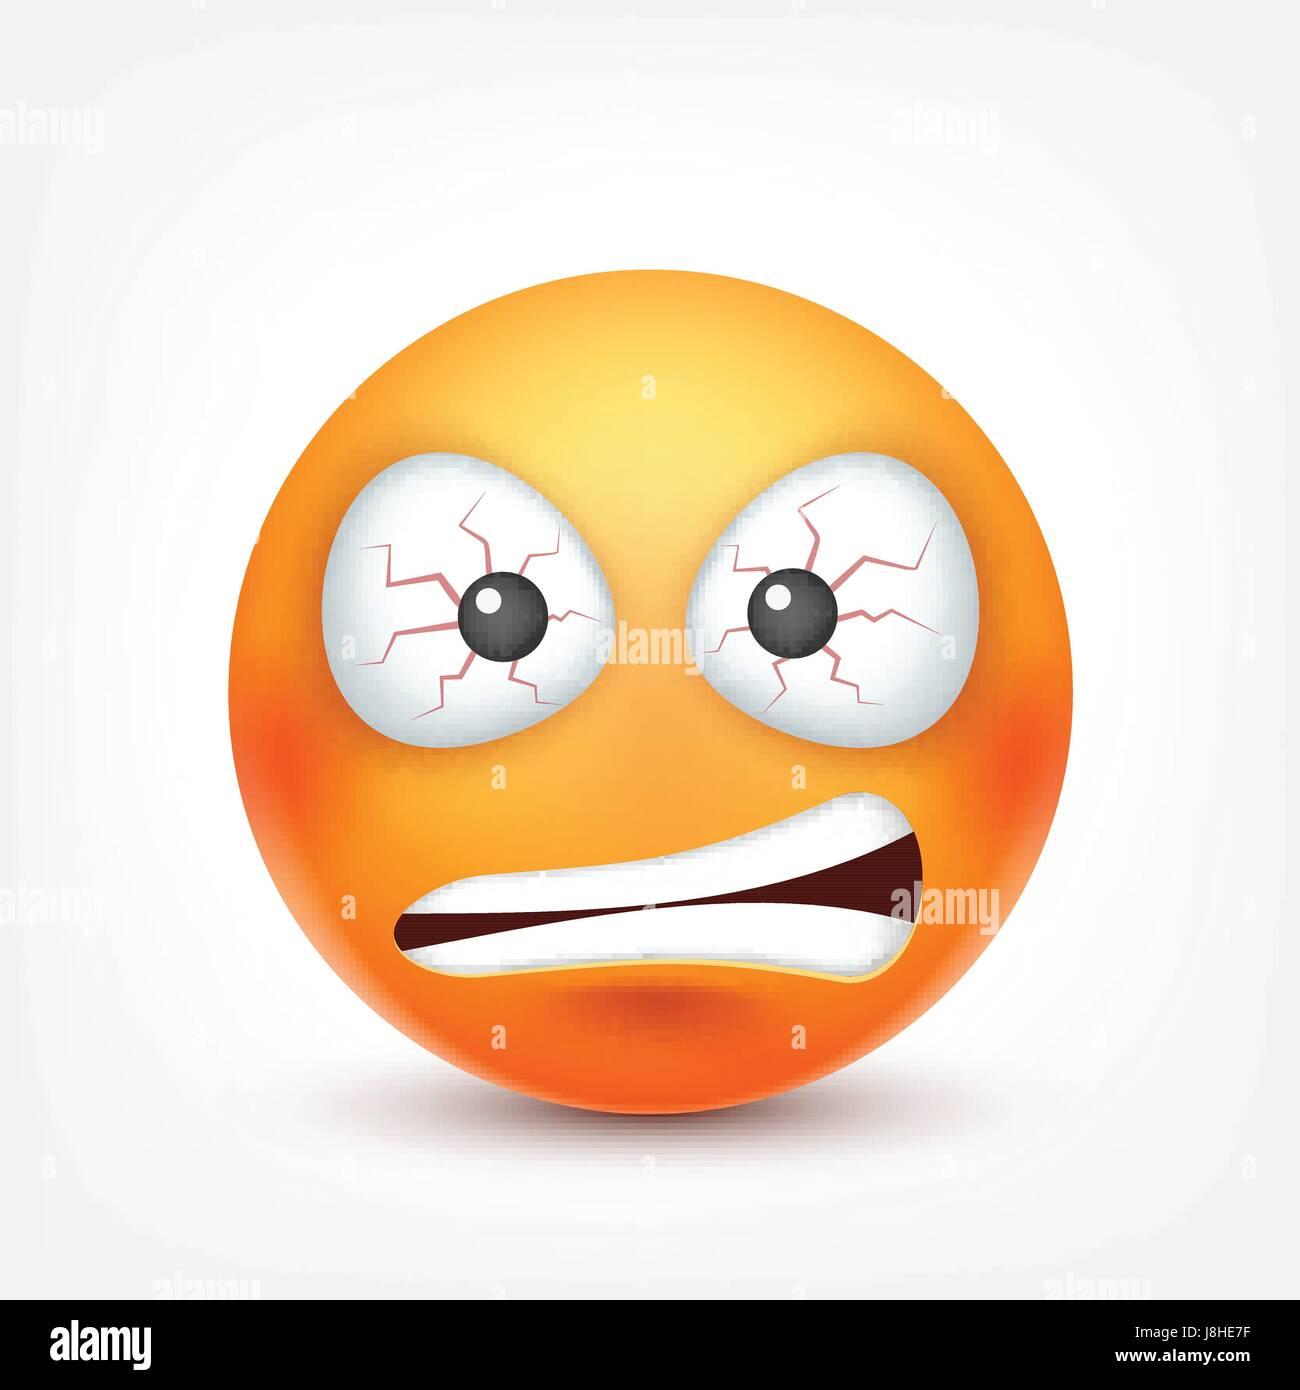 Smiley En Colere Triste Diable Emoticone Redface Avec Emotions L Expression Du Visage Emoji 3d Realiste Funny Cartoon Character L Humeur L Icone Web Vector Illustration Image Vectorielle Stock Alamy